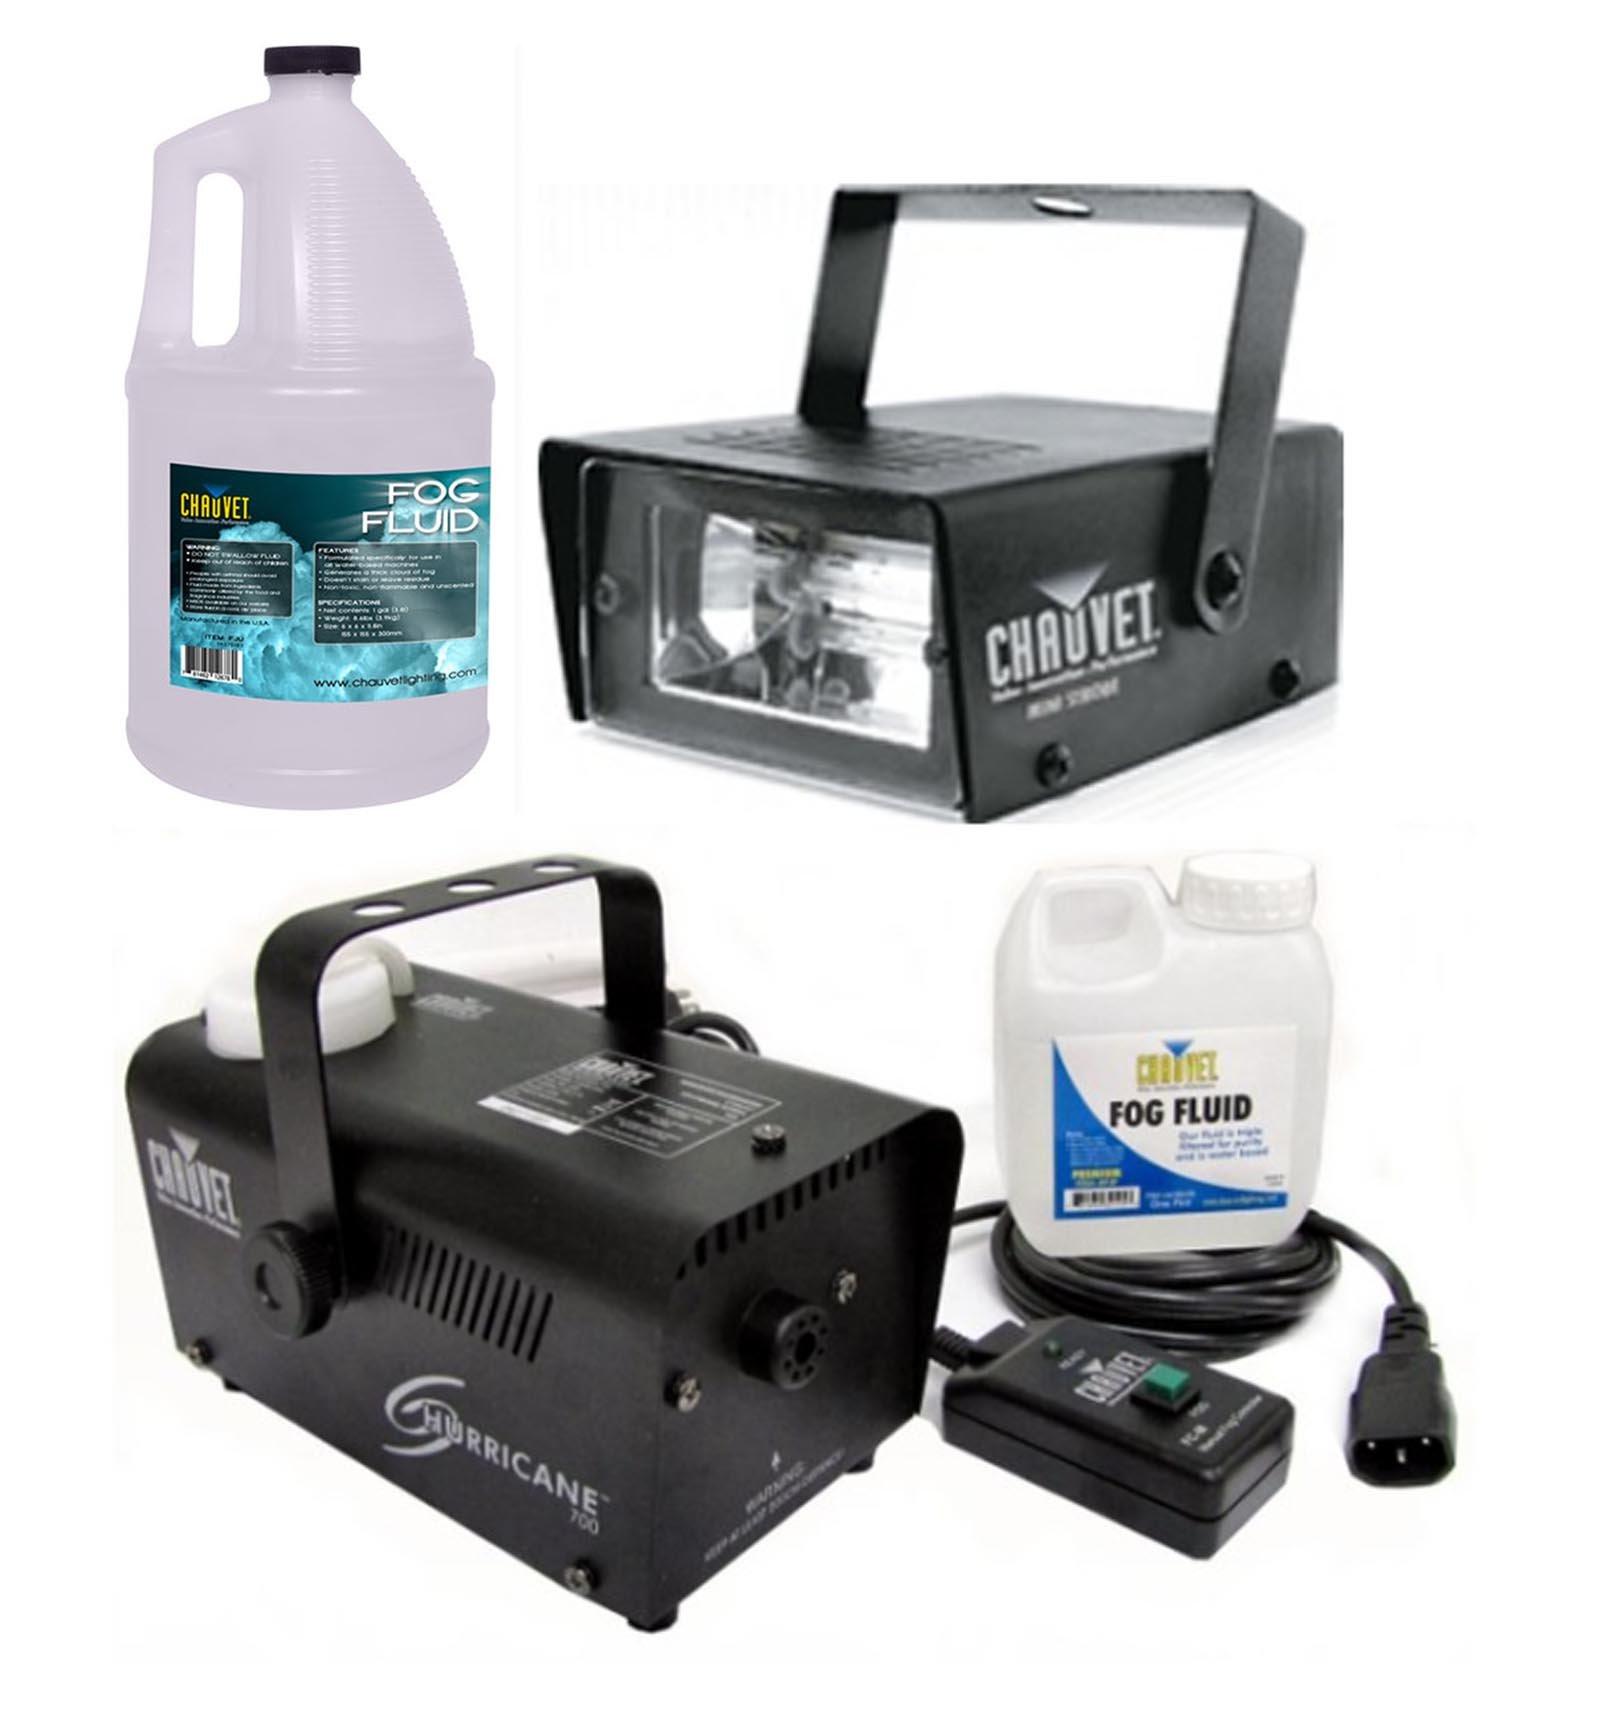 CHAUVET CH-730 Ministrobe Light + Hurrcane 700 H-700 Fog Machine + FJU Fog Fluid by CHAUVET DJ (Image #1)